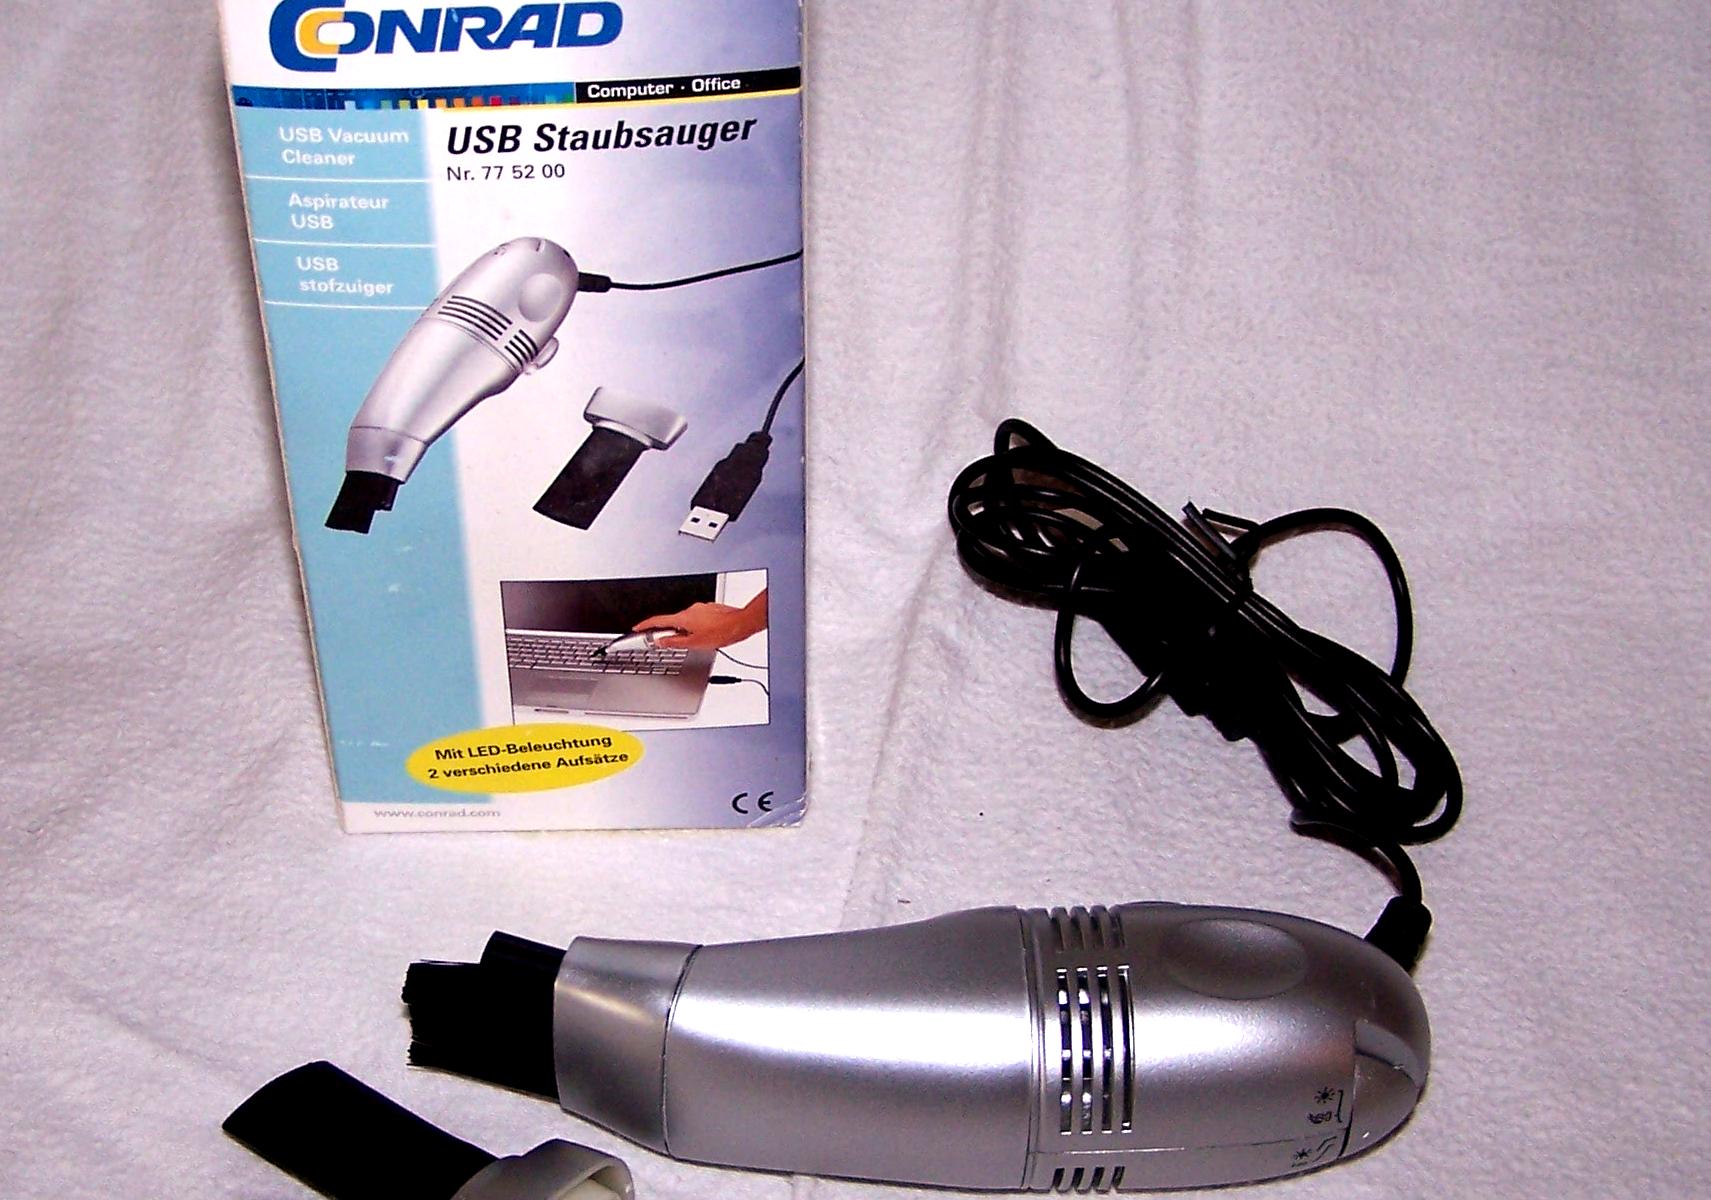 Büro - EDV-IT - USB-Staubsauger Conrad